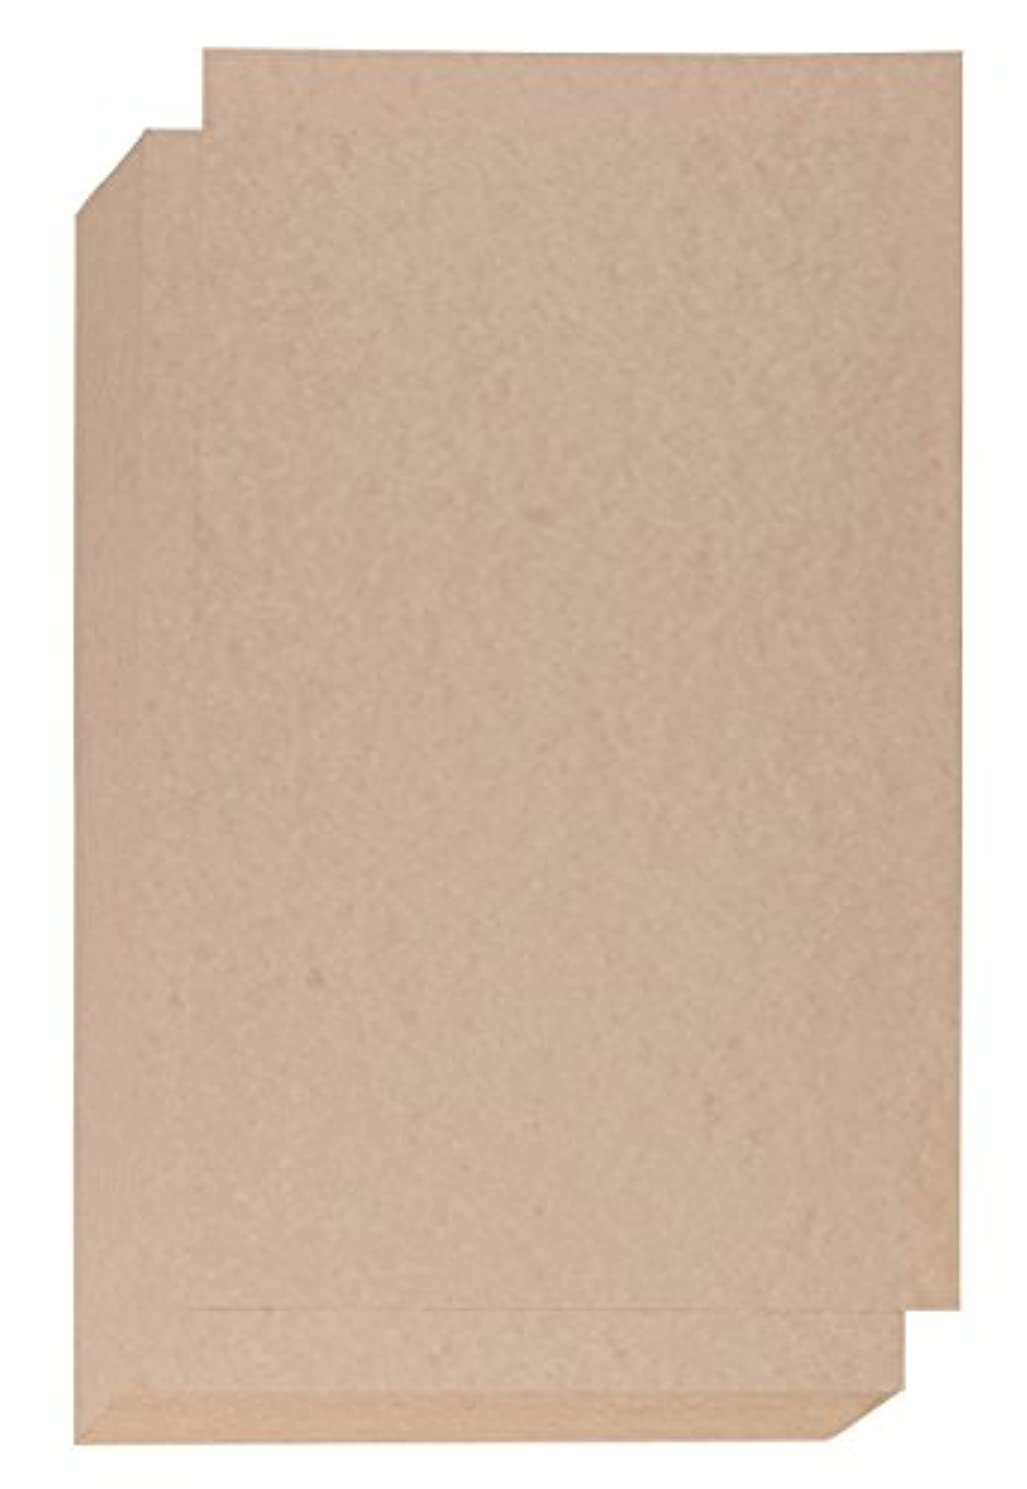 Parchment Paper - 60-Pack 8.5 x 14 Legal Size Natural Parchtone Paper, Vintage Scrapbook Cardstock Paper for Menu, Program, Document, 180GSM, Beige